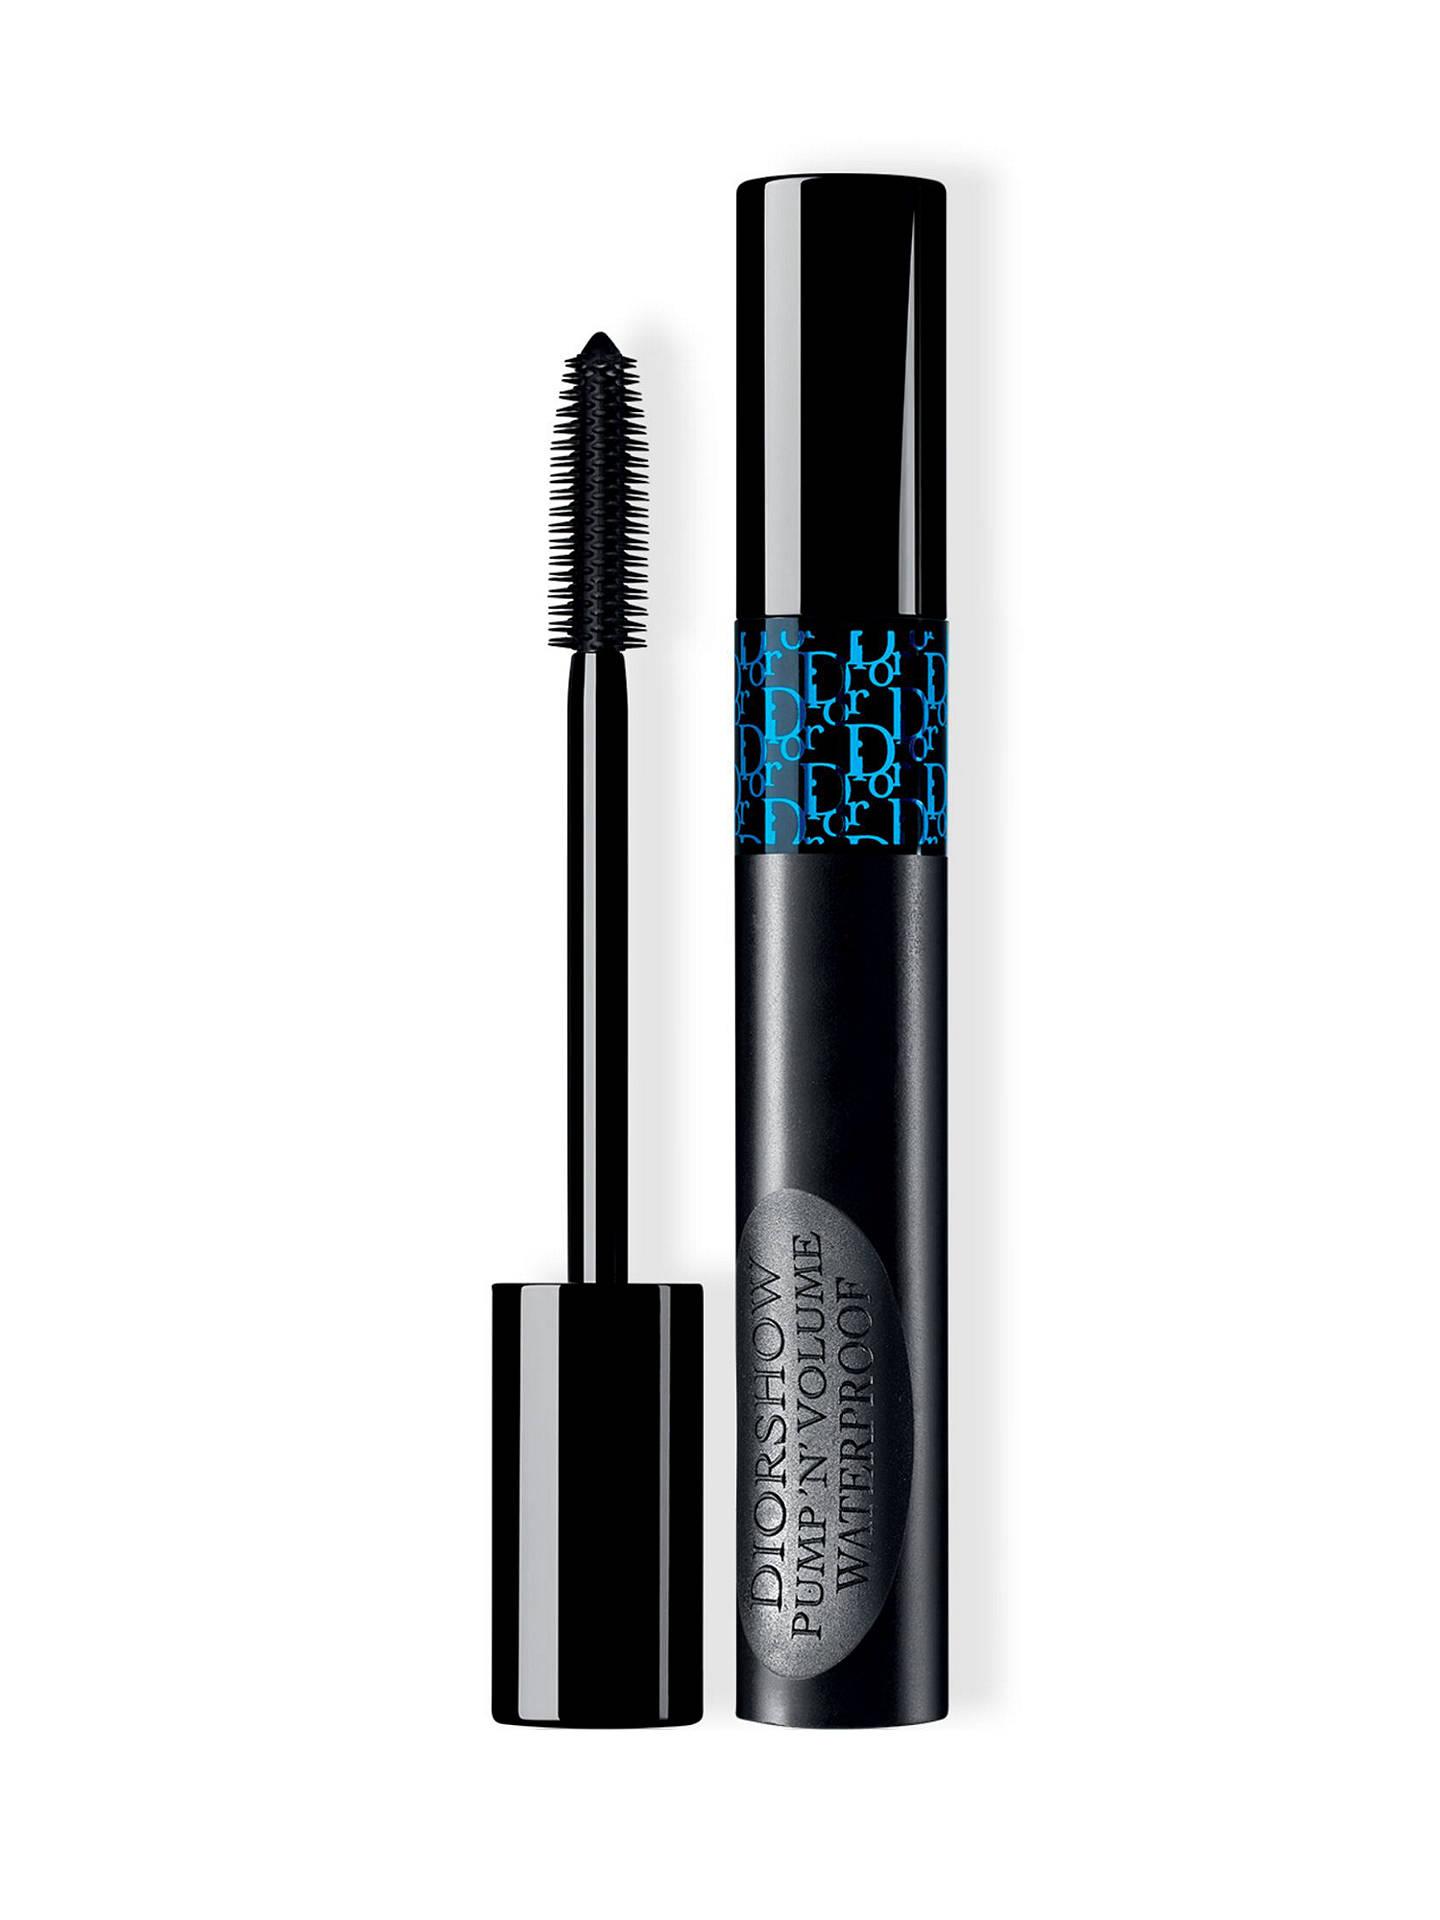 496b78a9f2e Buy Dior Diorshow Pump'N'Volume Waterproof Volumising Mascara, 090 Black  Pump Online ...